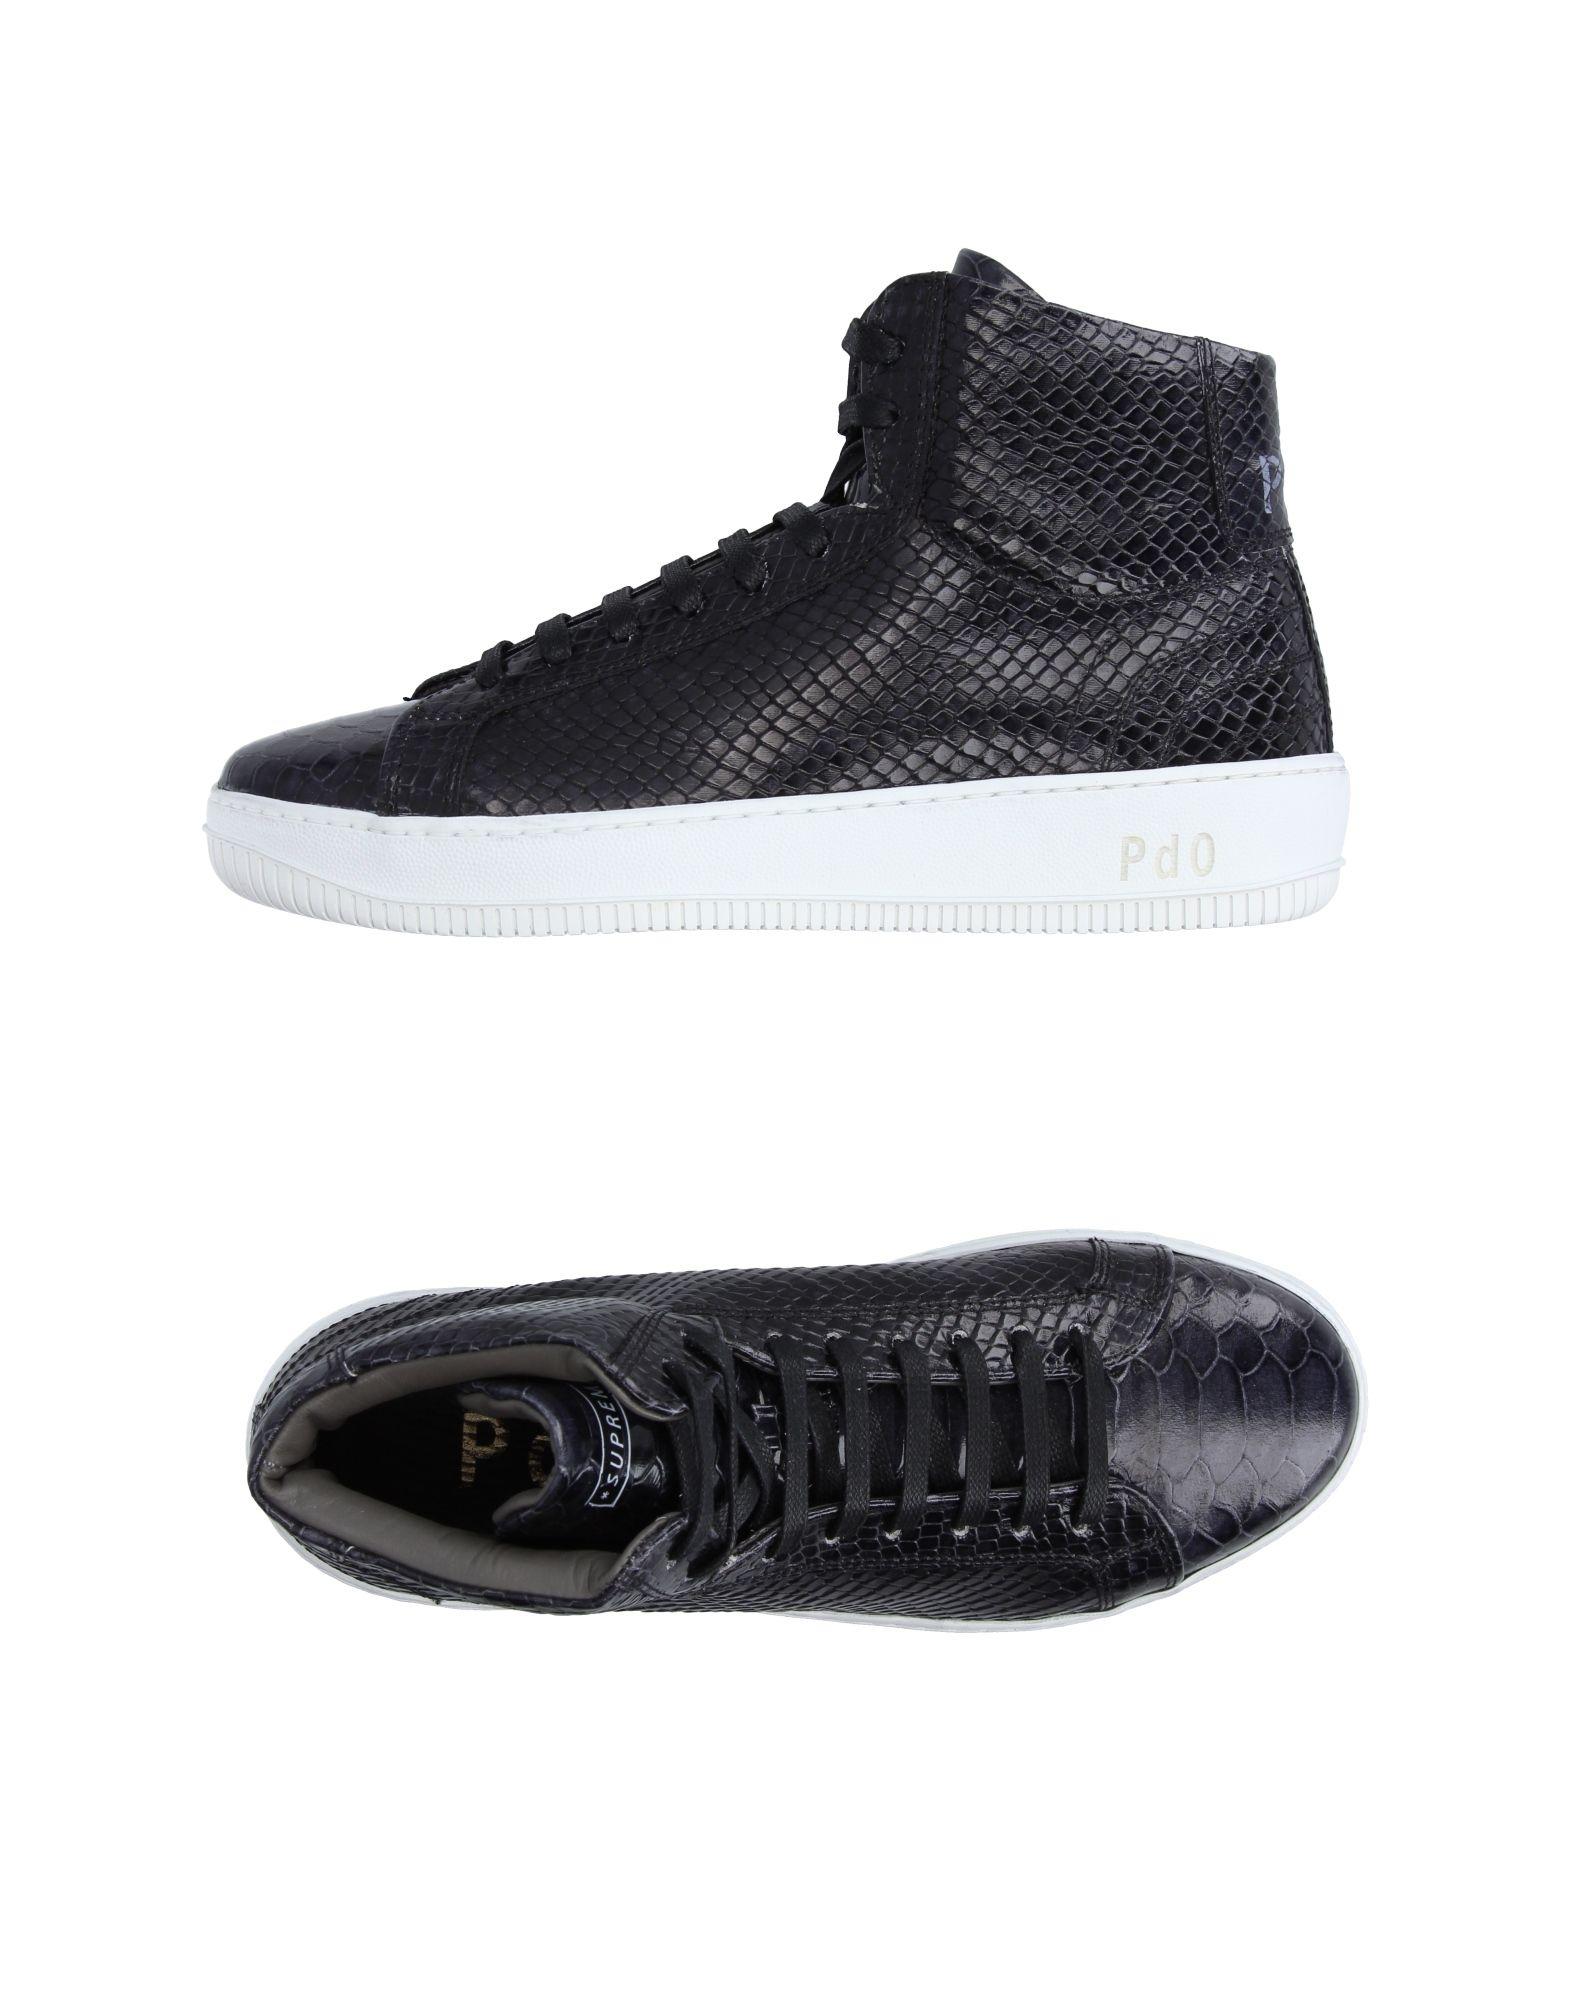 Pantofola D'oro Sneakers Damen  11228273SA Gute Qualität beliebte Schuhe